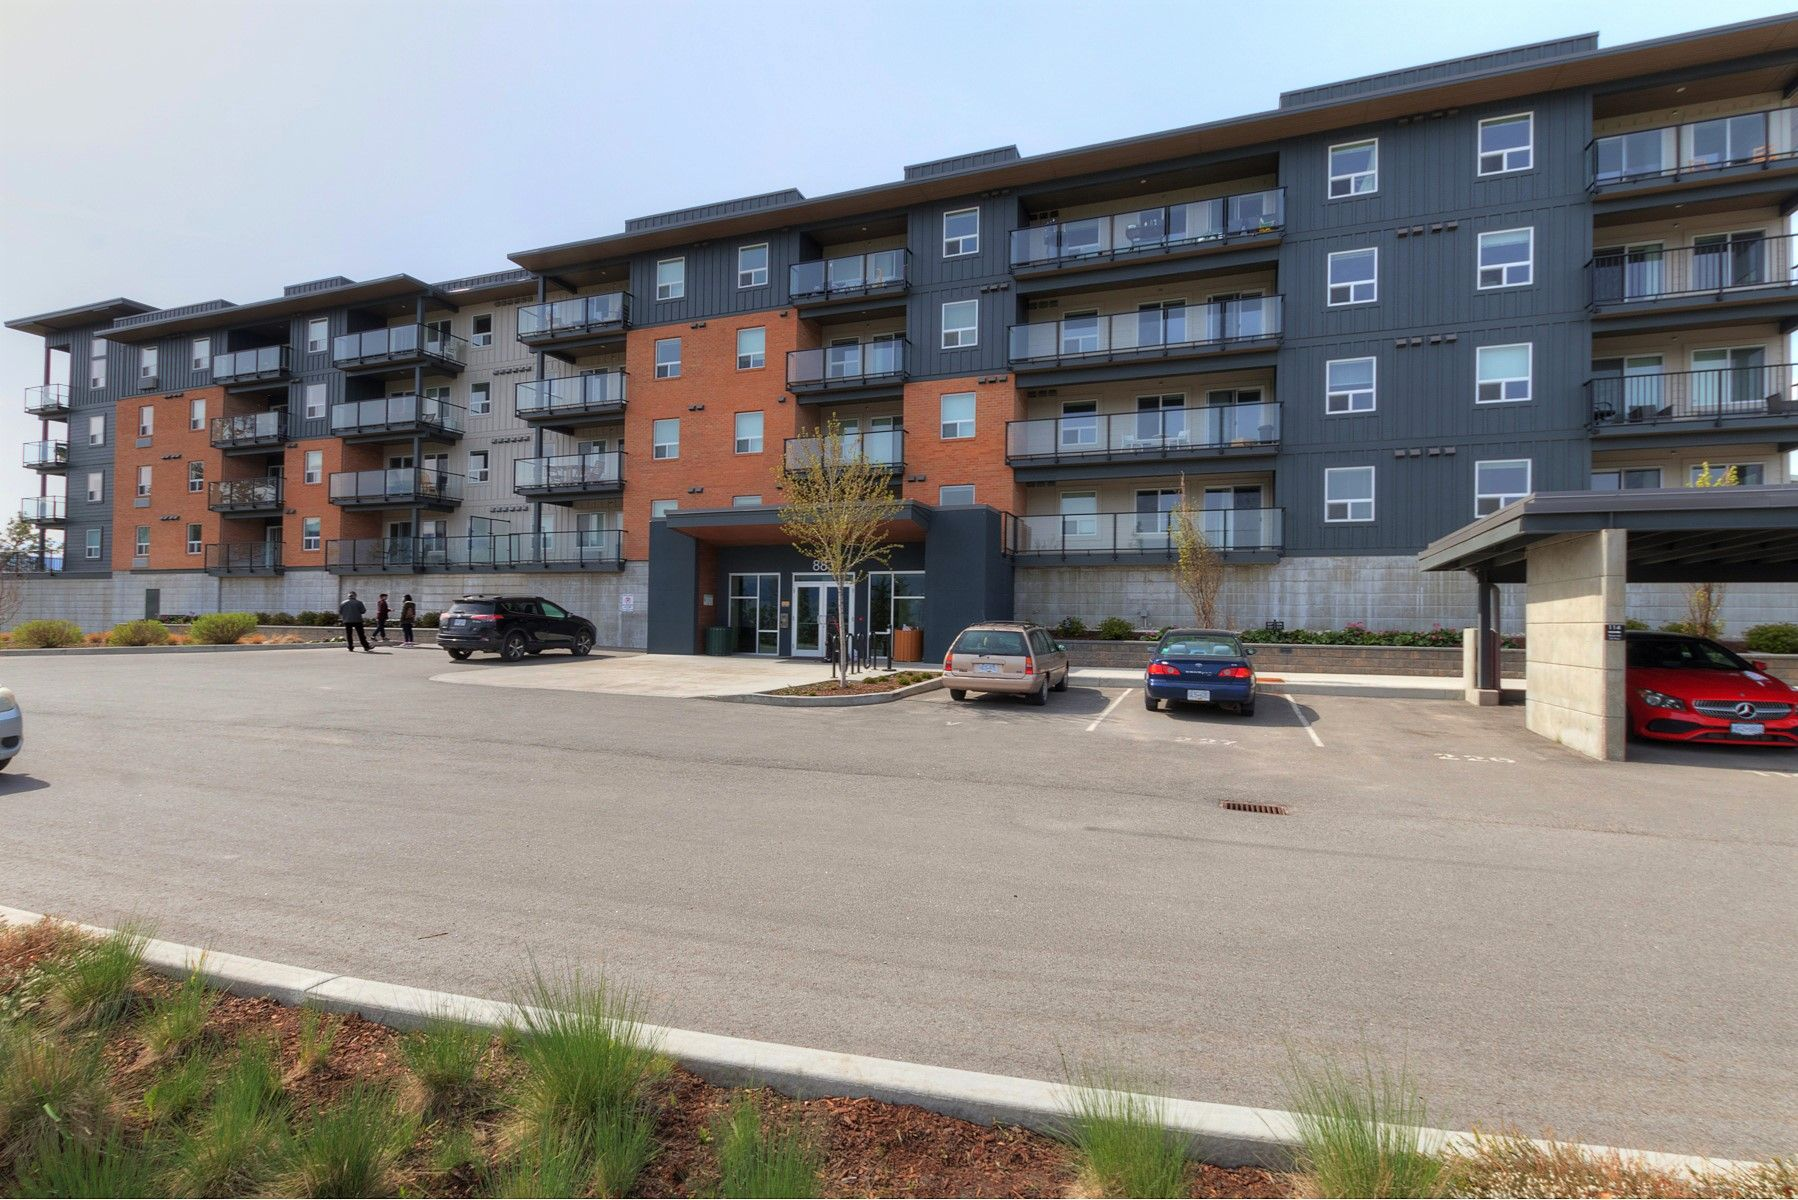 Main Photo: 211 883 Academy Way in Kelowna: University District Multi-family for sale (Central Okanagan)  : MLS®# 10238519